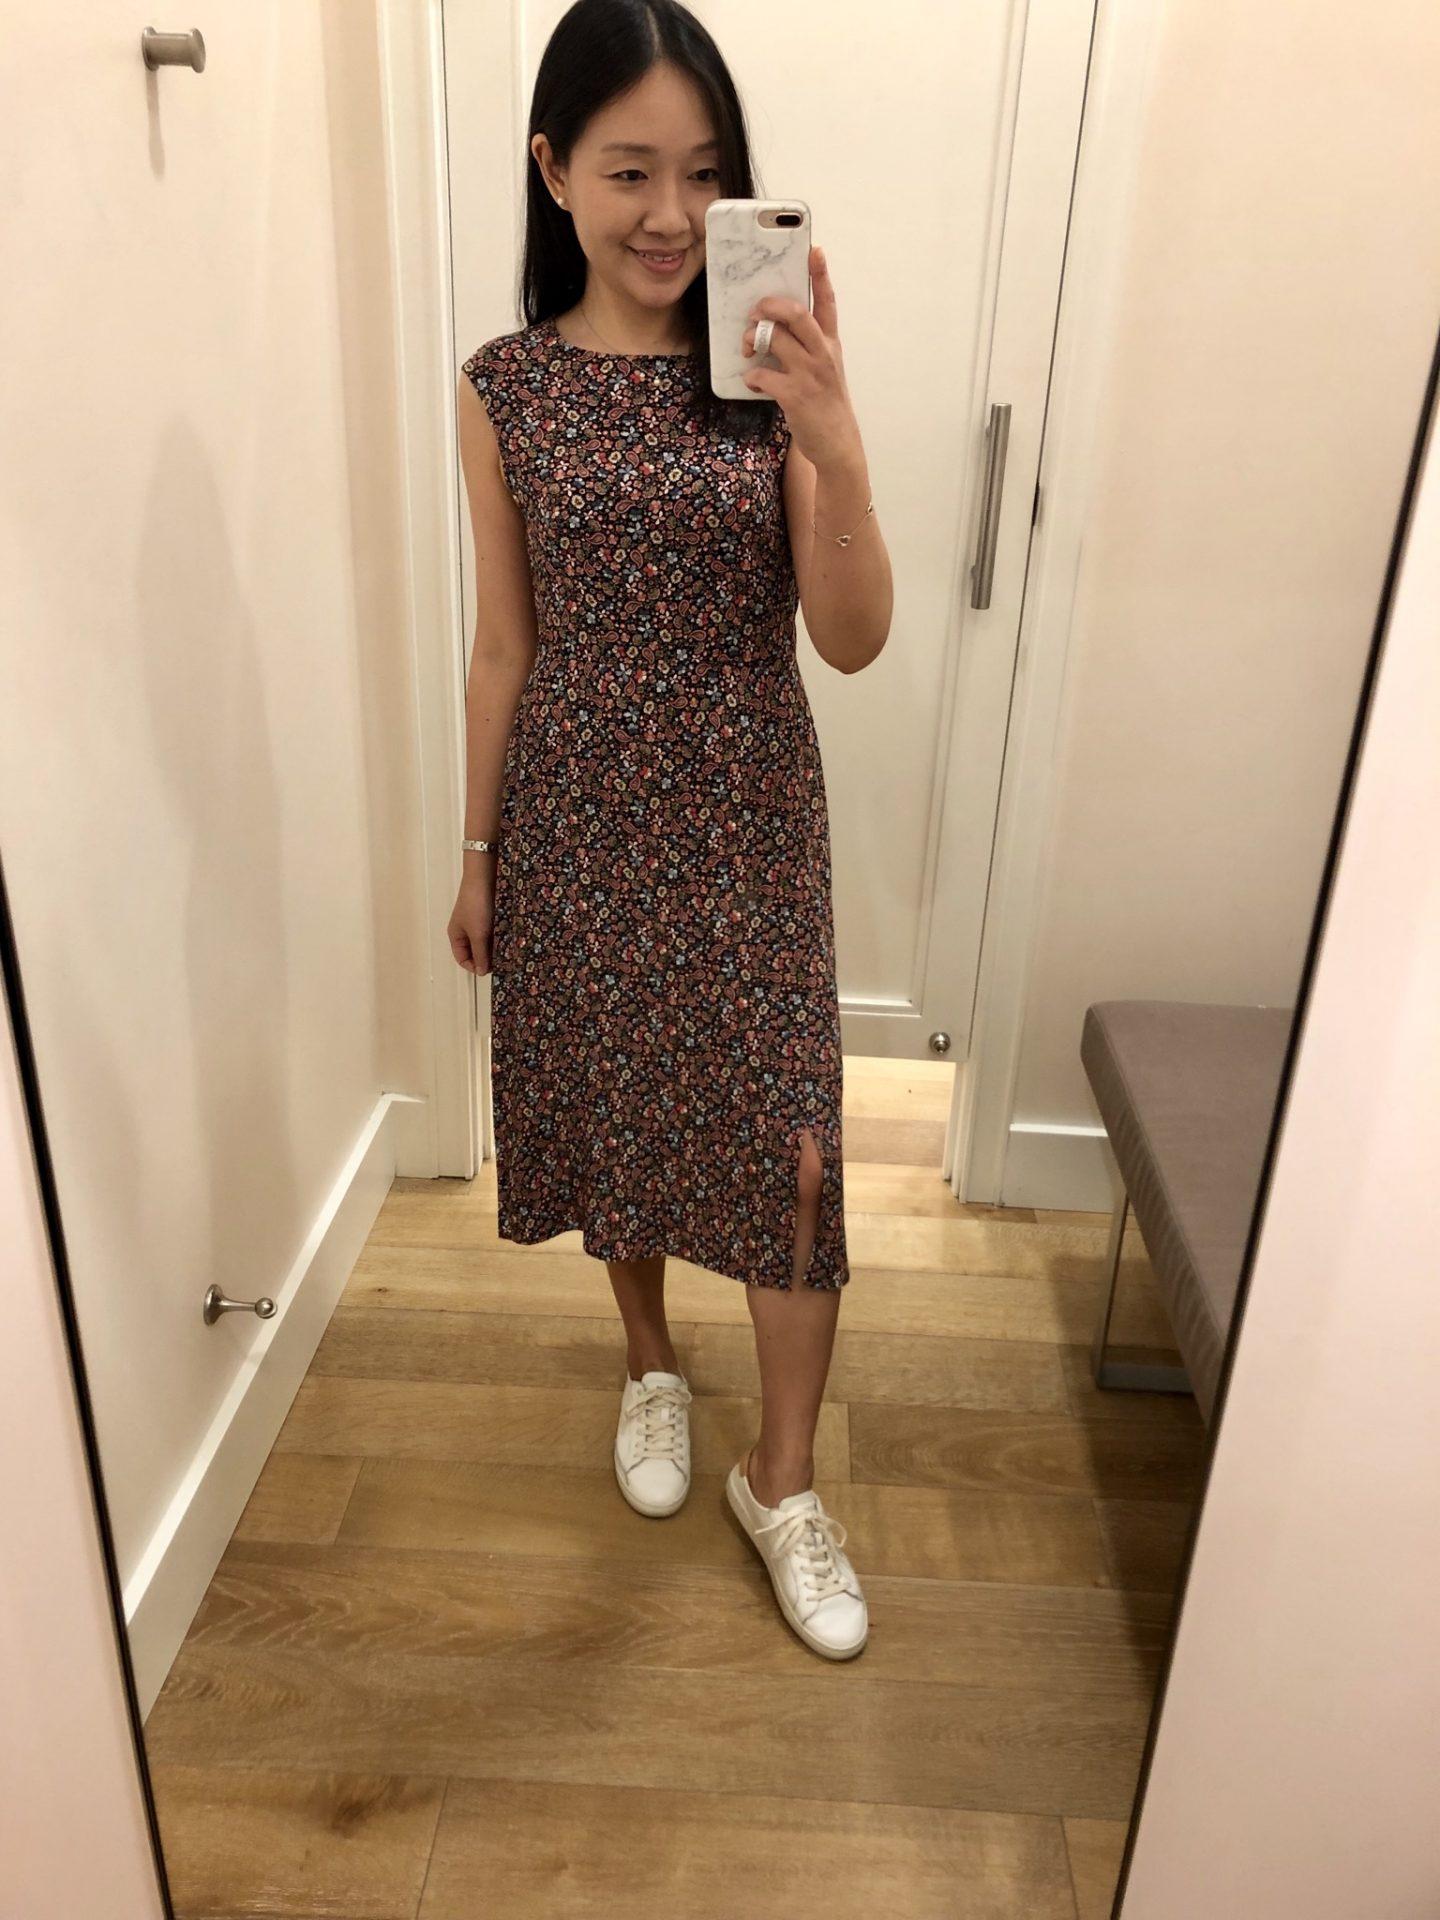 LOFT Vine Cap Sleeve Midi Dress, size 2P